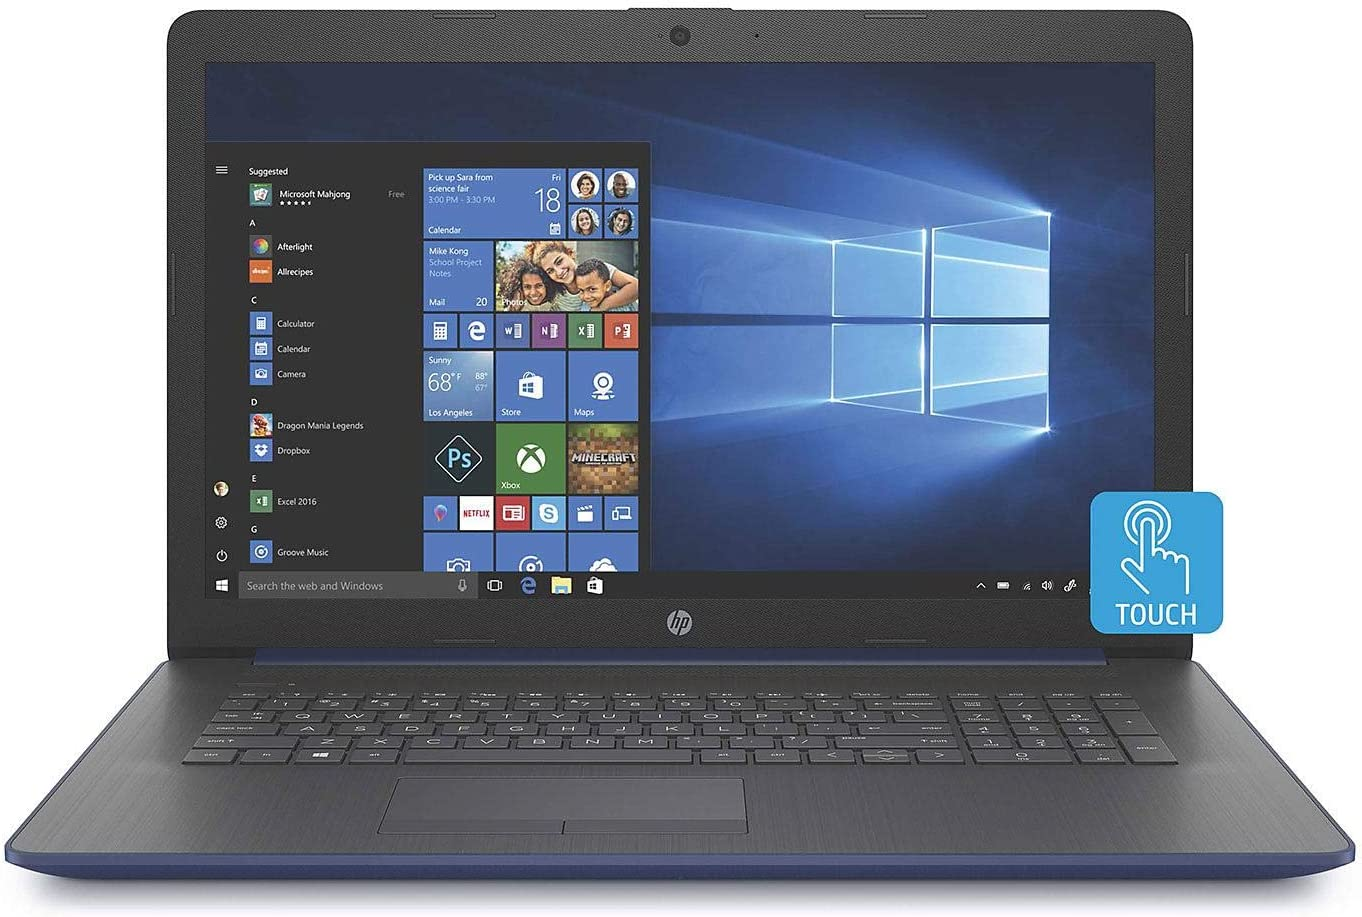 "HP 17.3"" HD+ SVA BrightView WLED-Backlit Touchscreen Laptop, Intel Quad-Core i5-8265U up to 3.9GHz, 8GB DDR4, 256GB NVMe SSD, Optical Drive, Bluetooth, Wi-Fi, HD Audio, HD Webcam, HDMI, Windows 10"